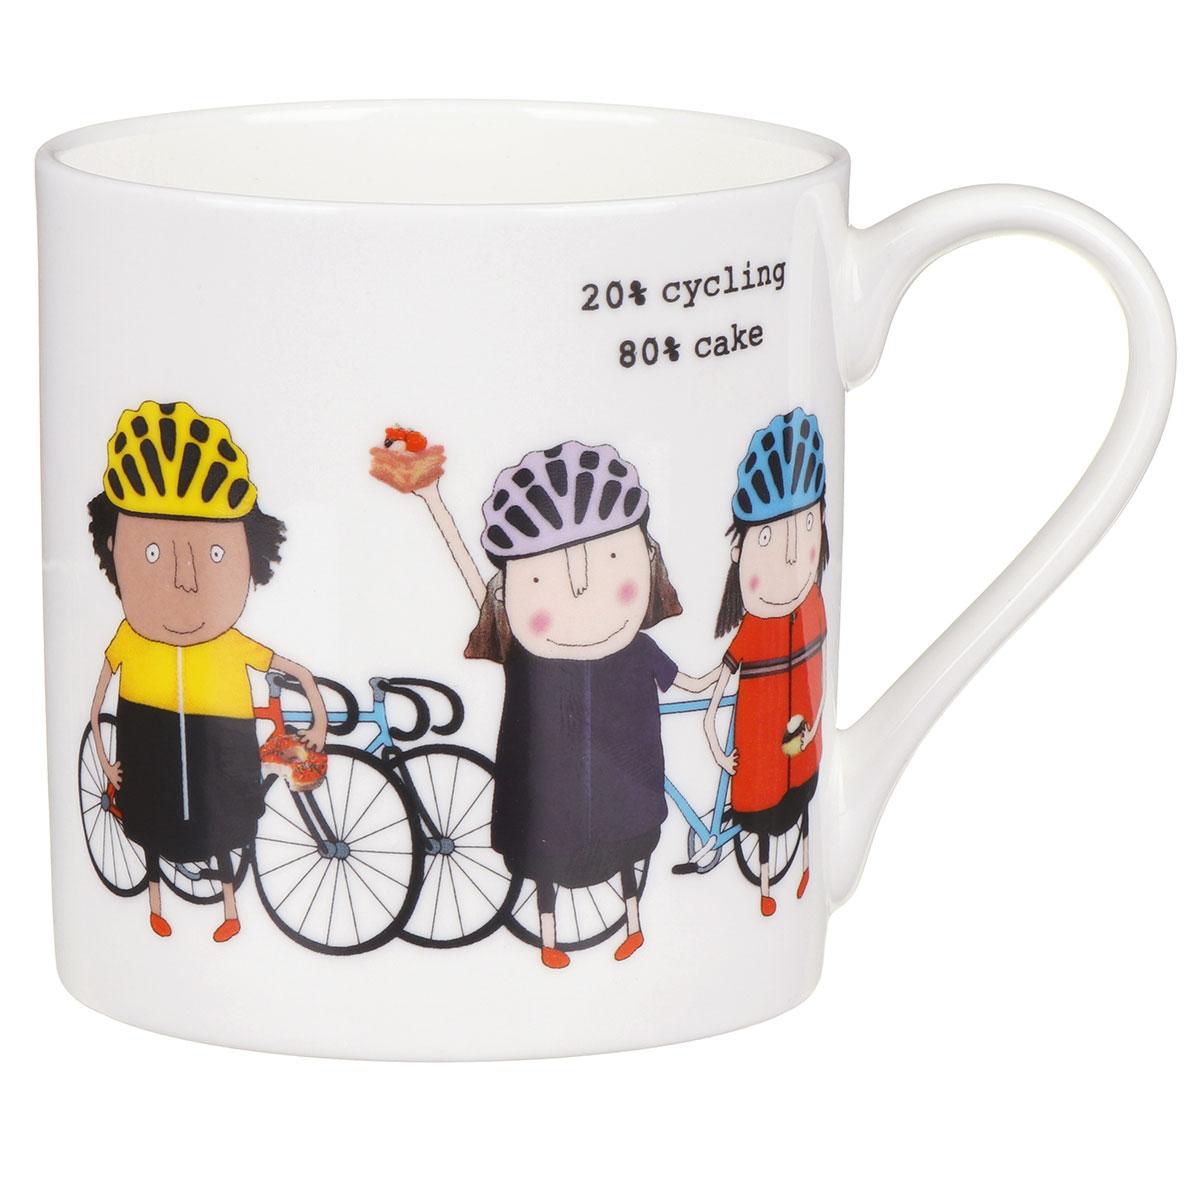 Rosie Made A Thing Cycling/Cake Mug